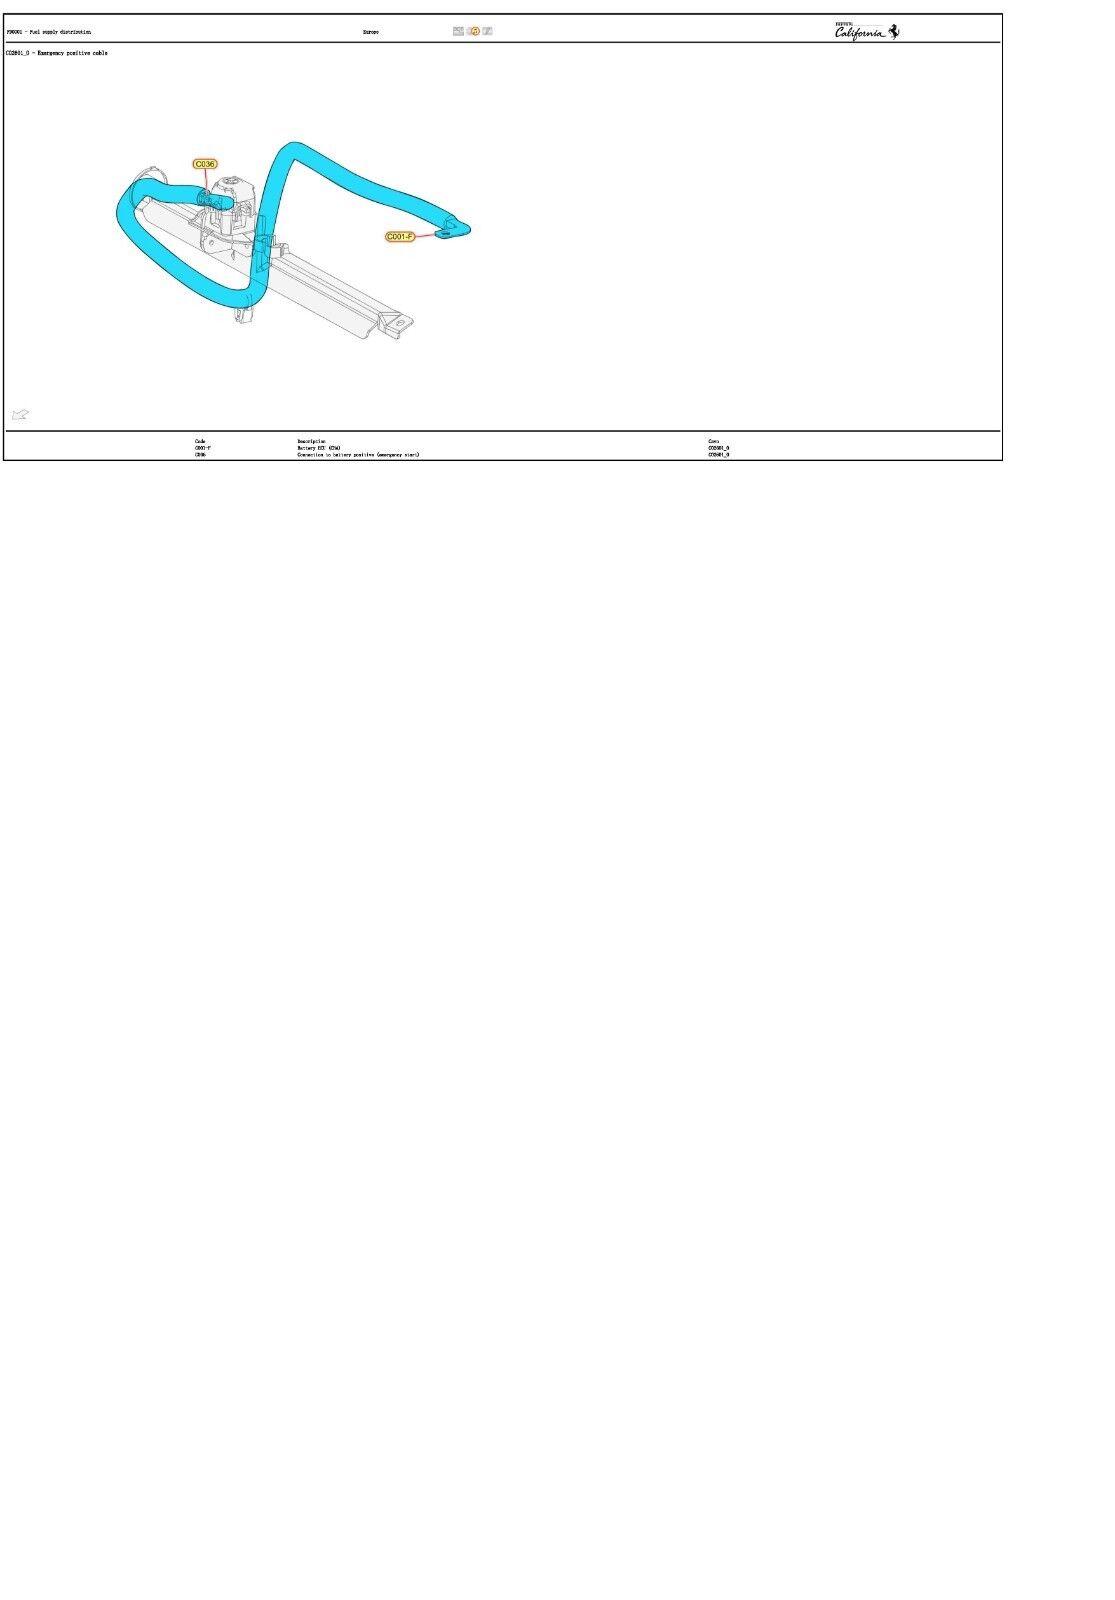 Astonishing California Wiring Diagrams Manual Ferrari Njrhkn6400 Service Wiring Digital Resources Ntnesshebarightsorg